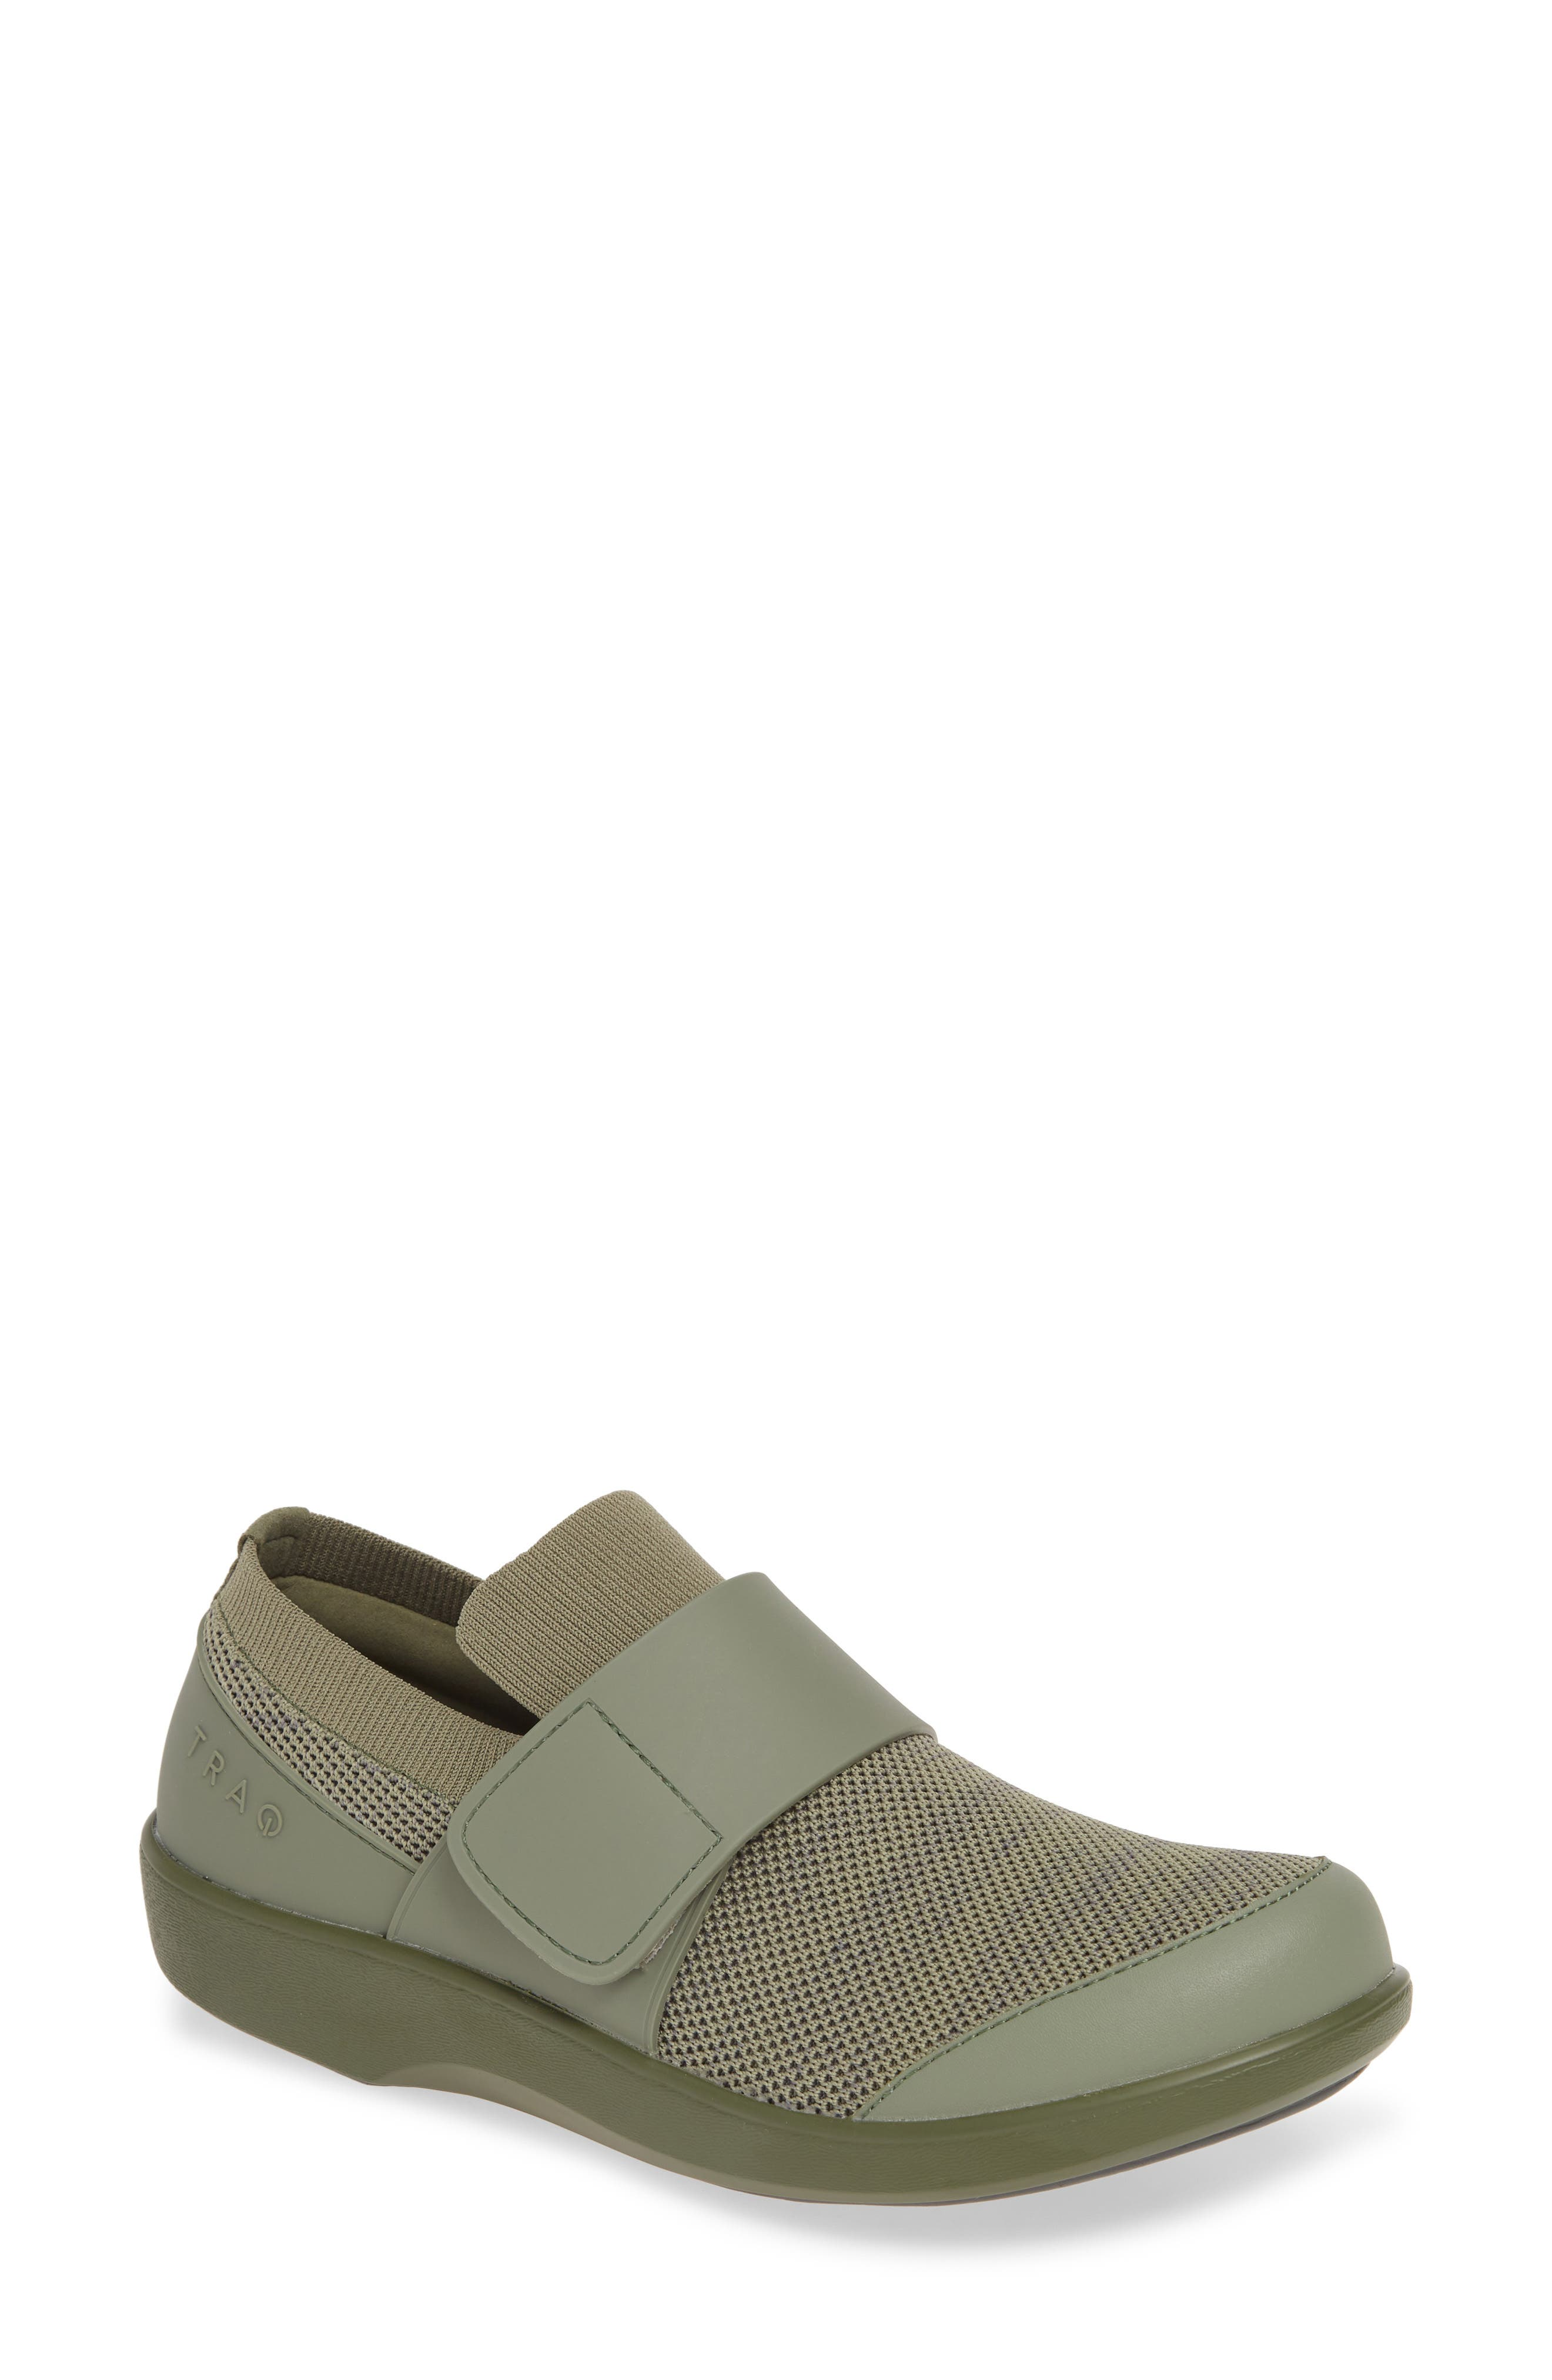 Alegria Qwik Sneaker, Green